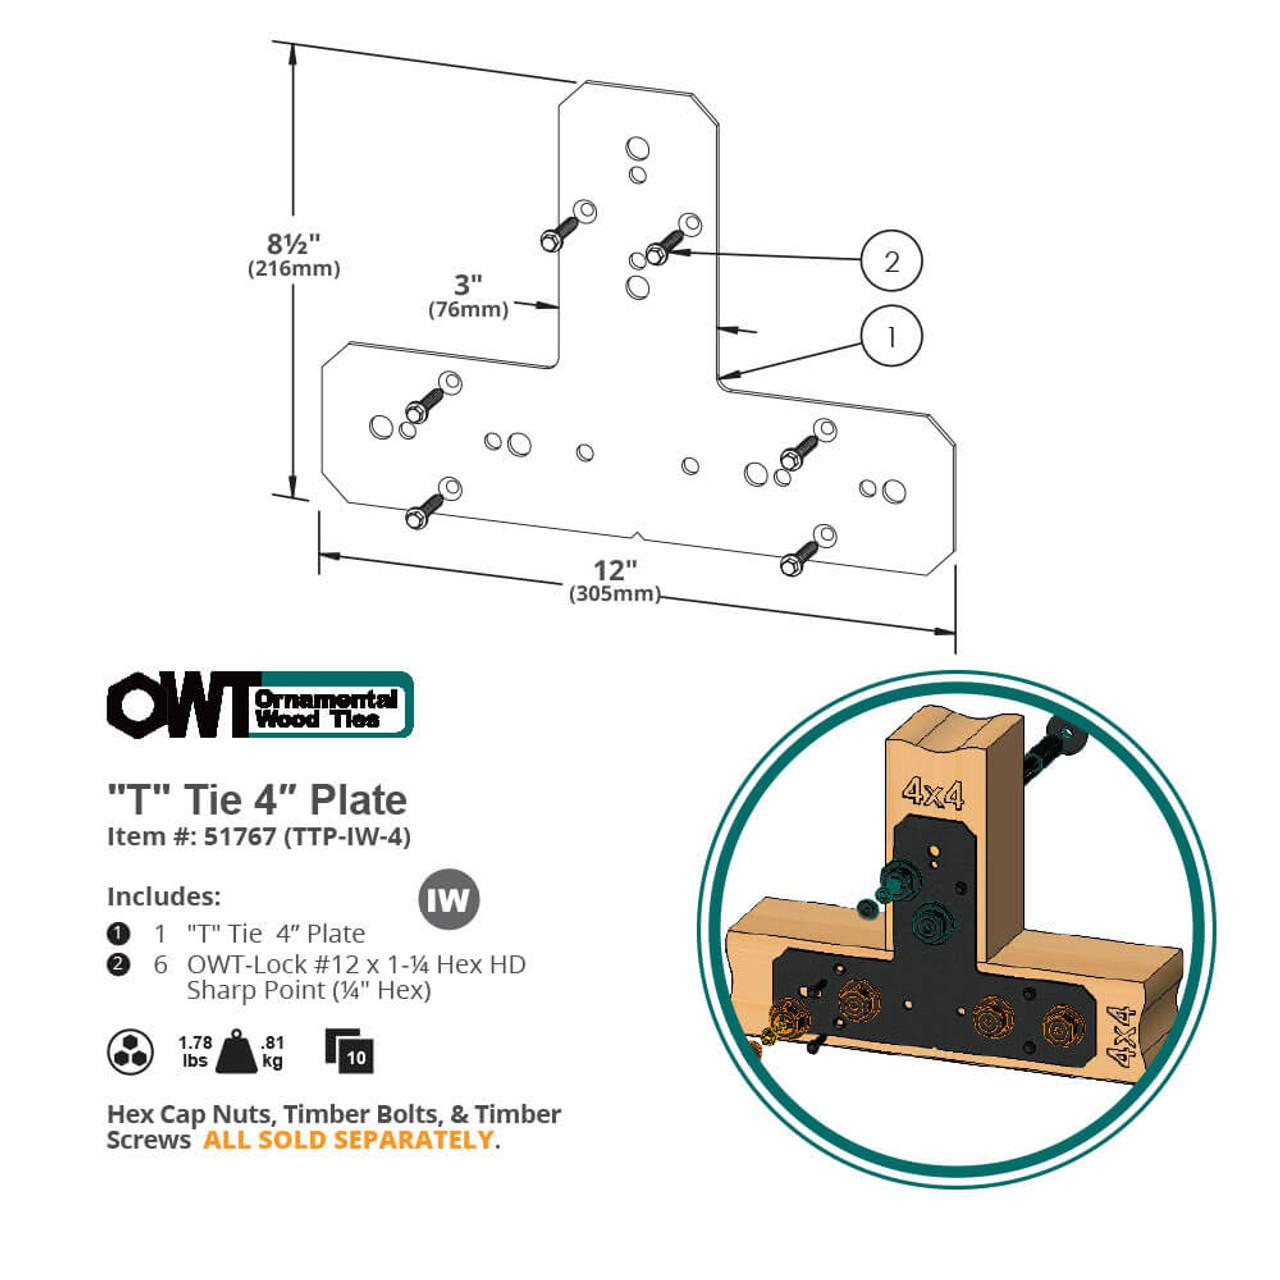 T-Tie Truss Tie Plate Drawing from OZCO Ornamental Wood Ties Hardware